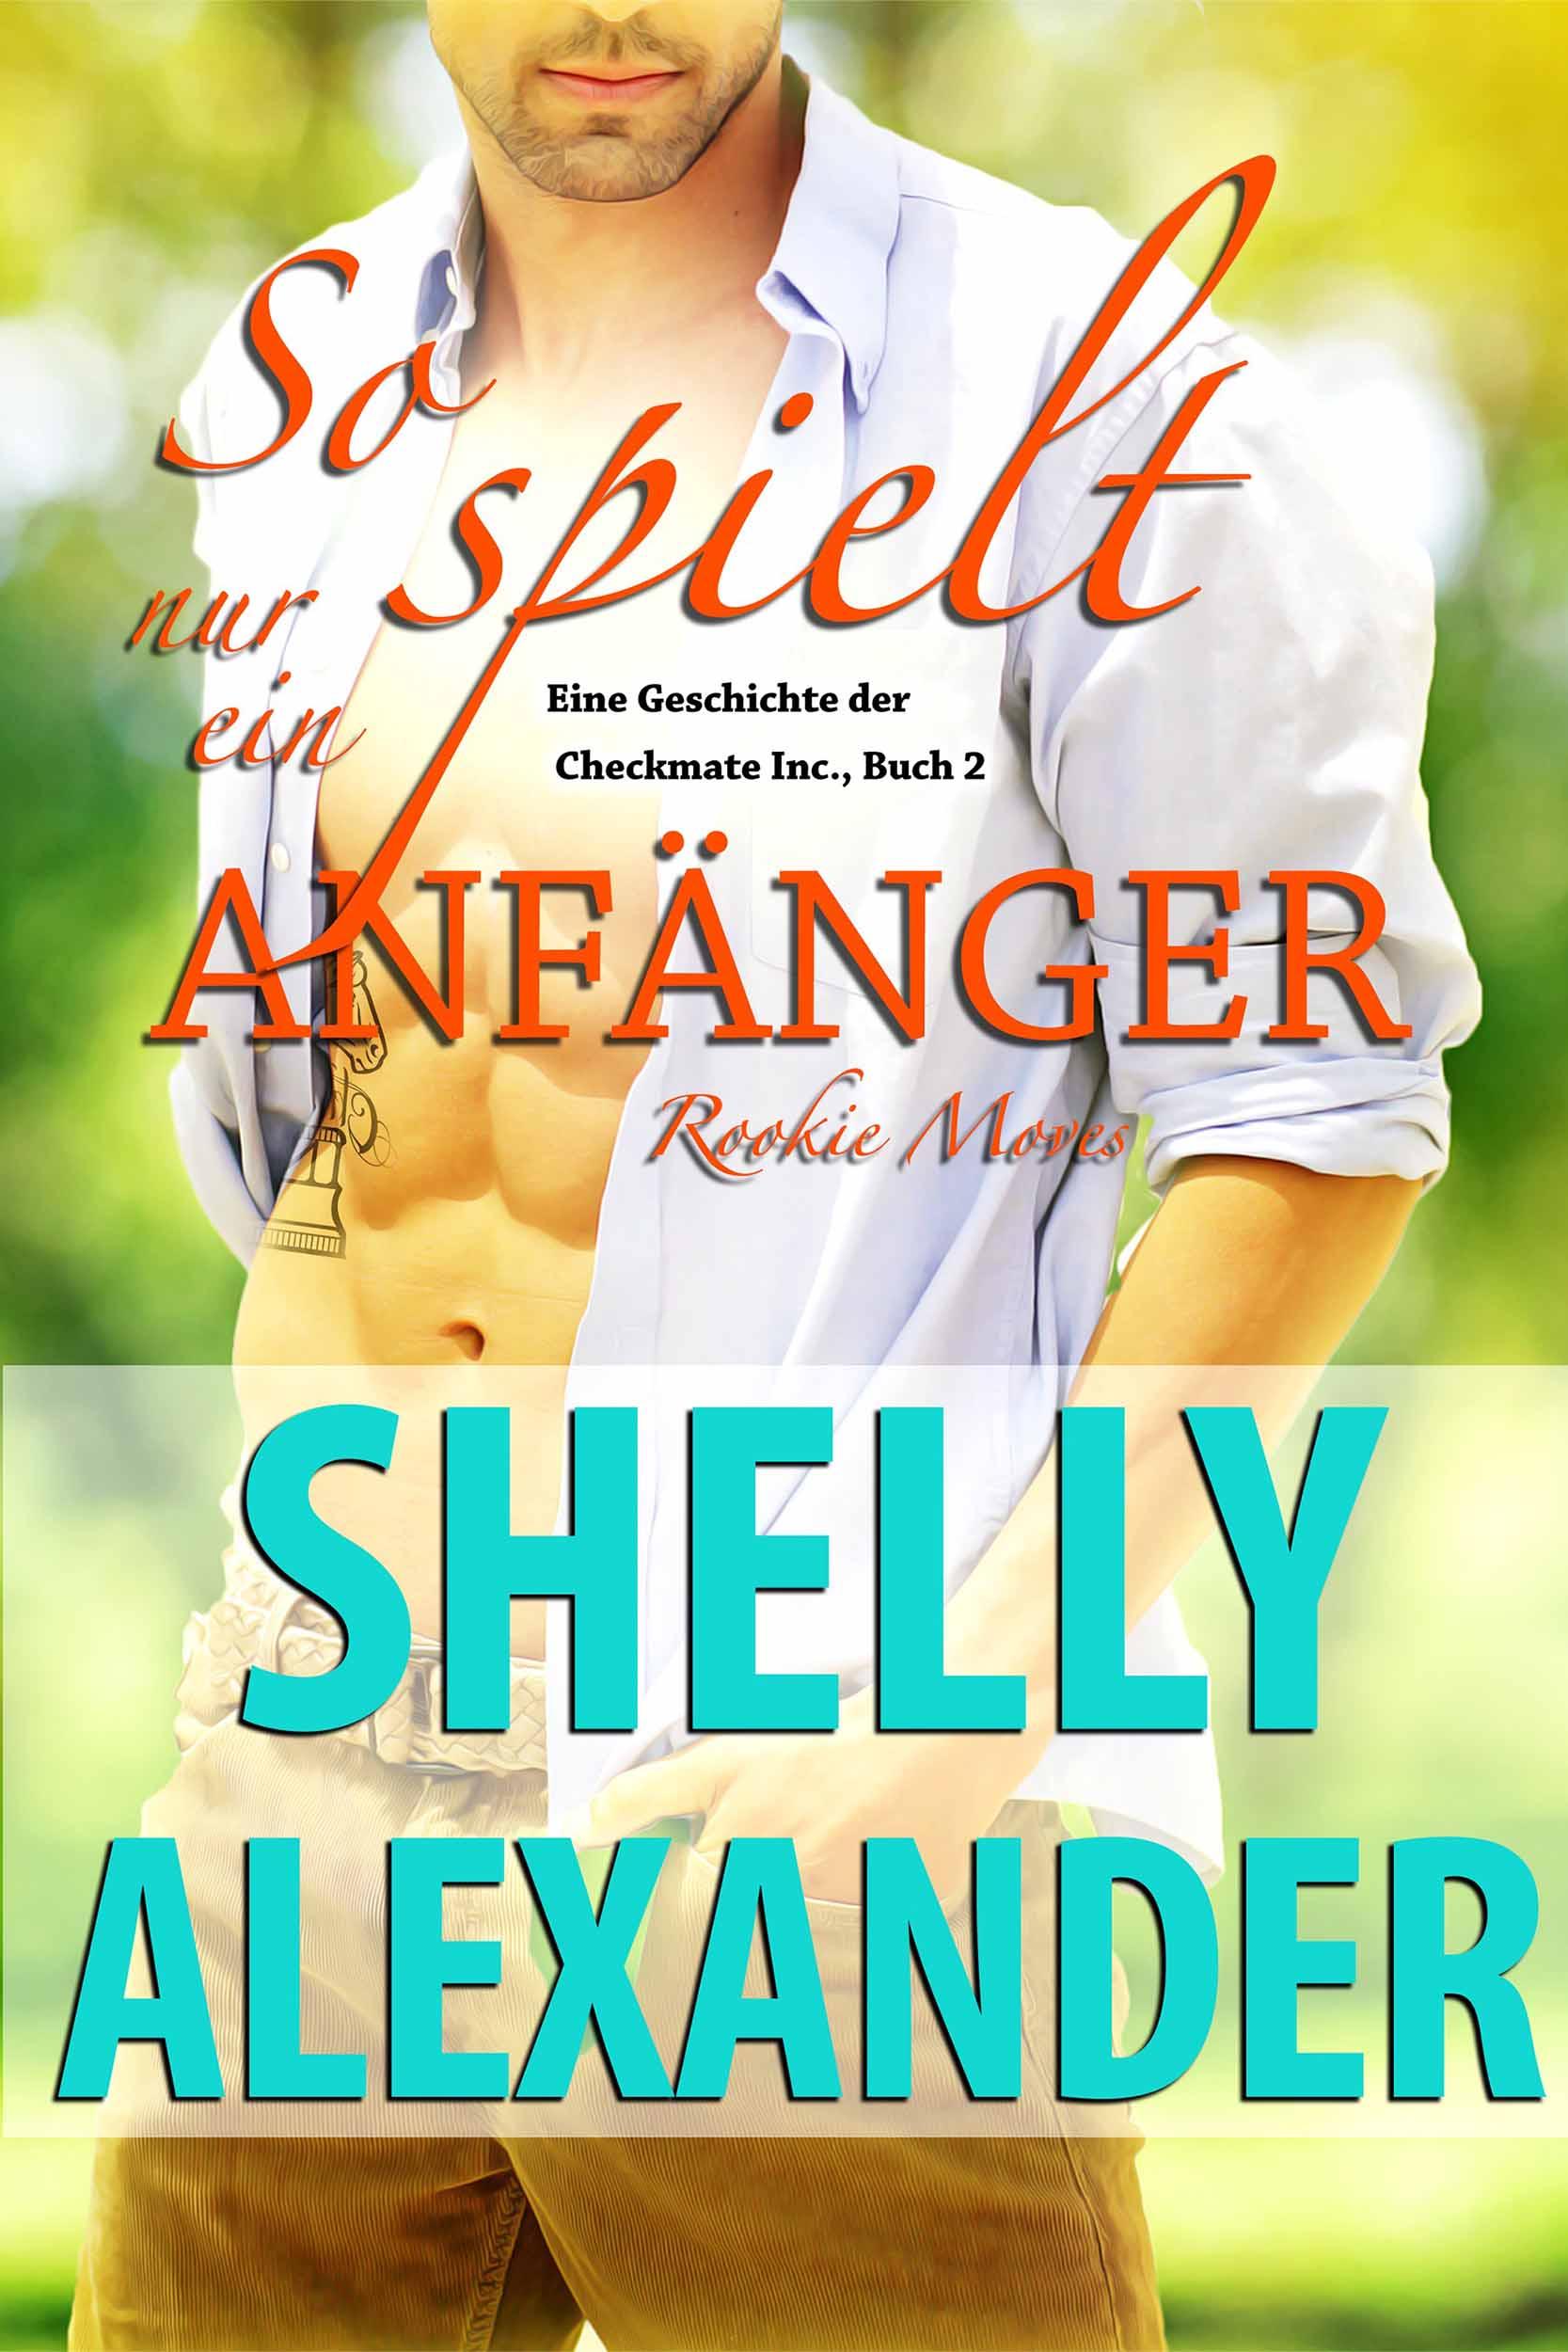 Shelly Alexander Rookie Moves German.jpg